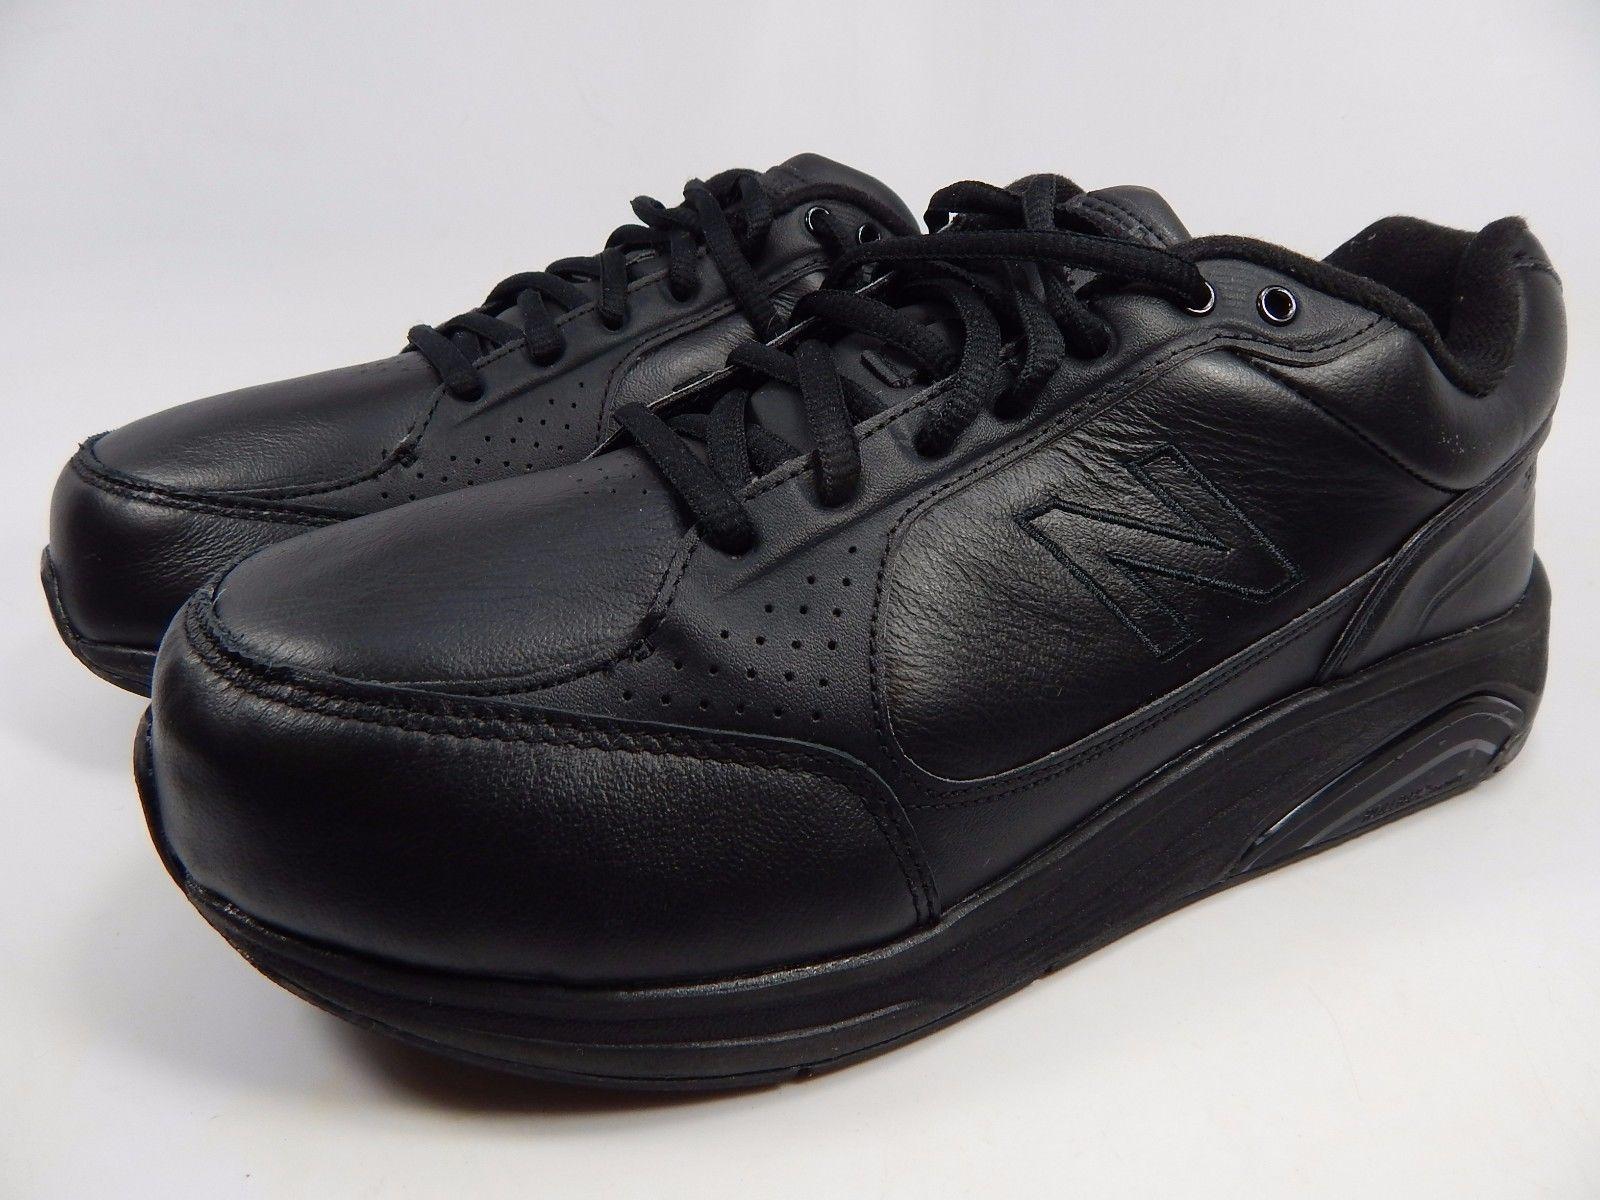 b1279f8bc55 New Balance 928 Women s Walking Shoes Size US 9.5 4E EXTRA WIDE EU 41  WW928BK